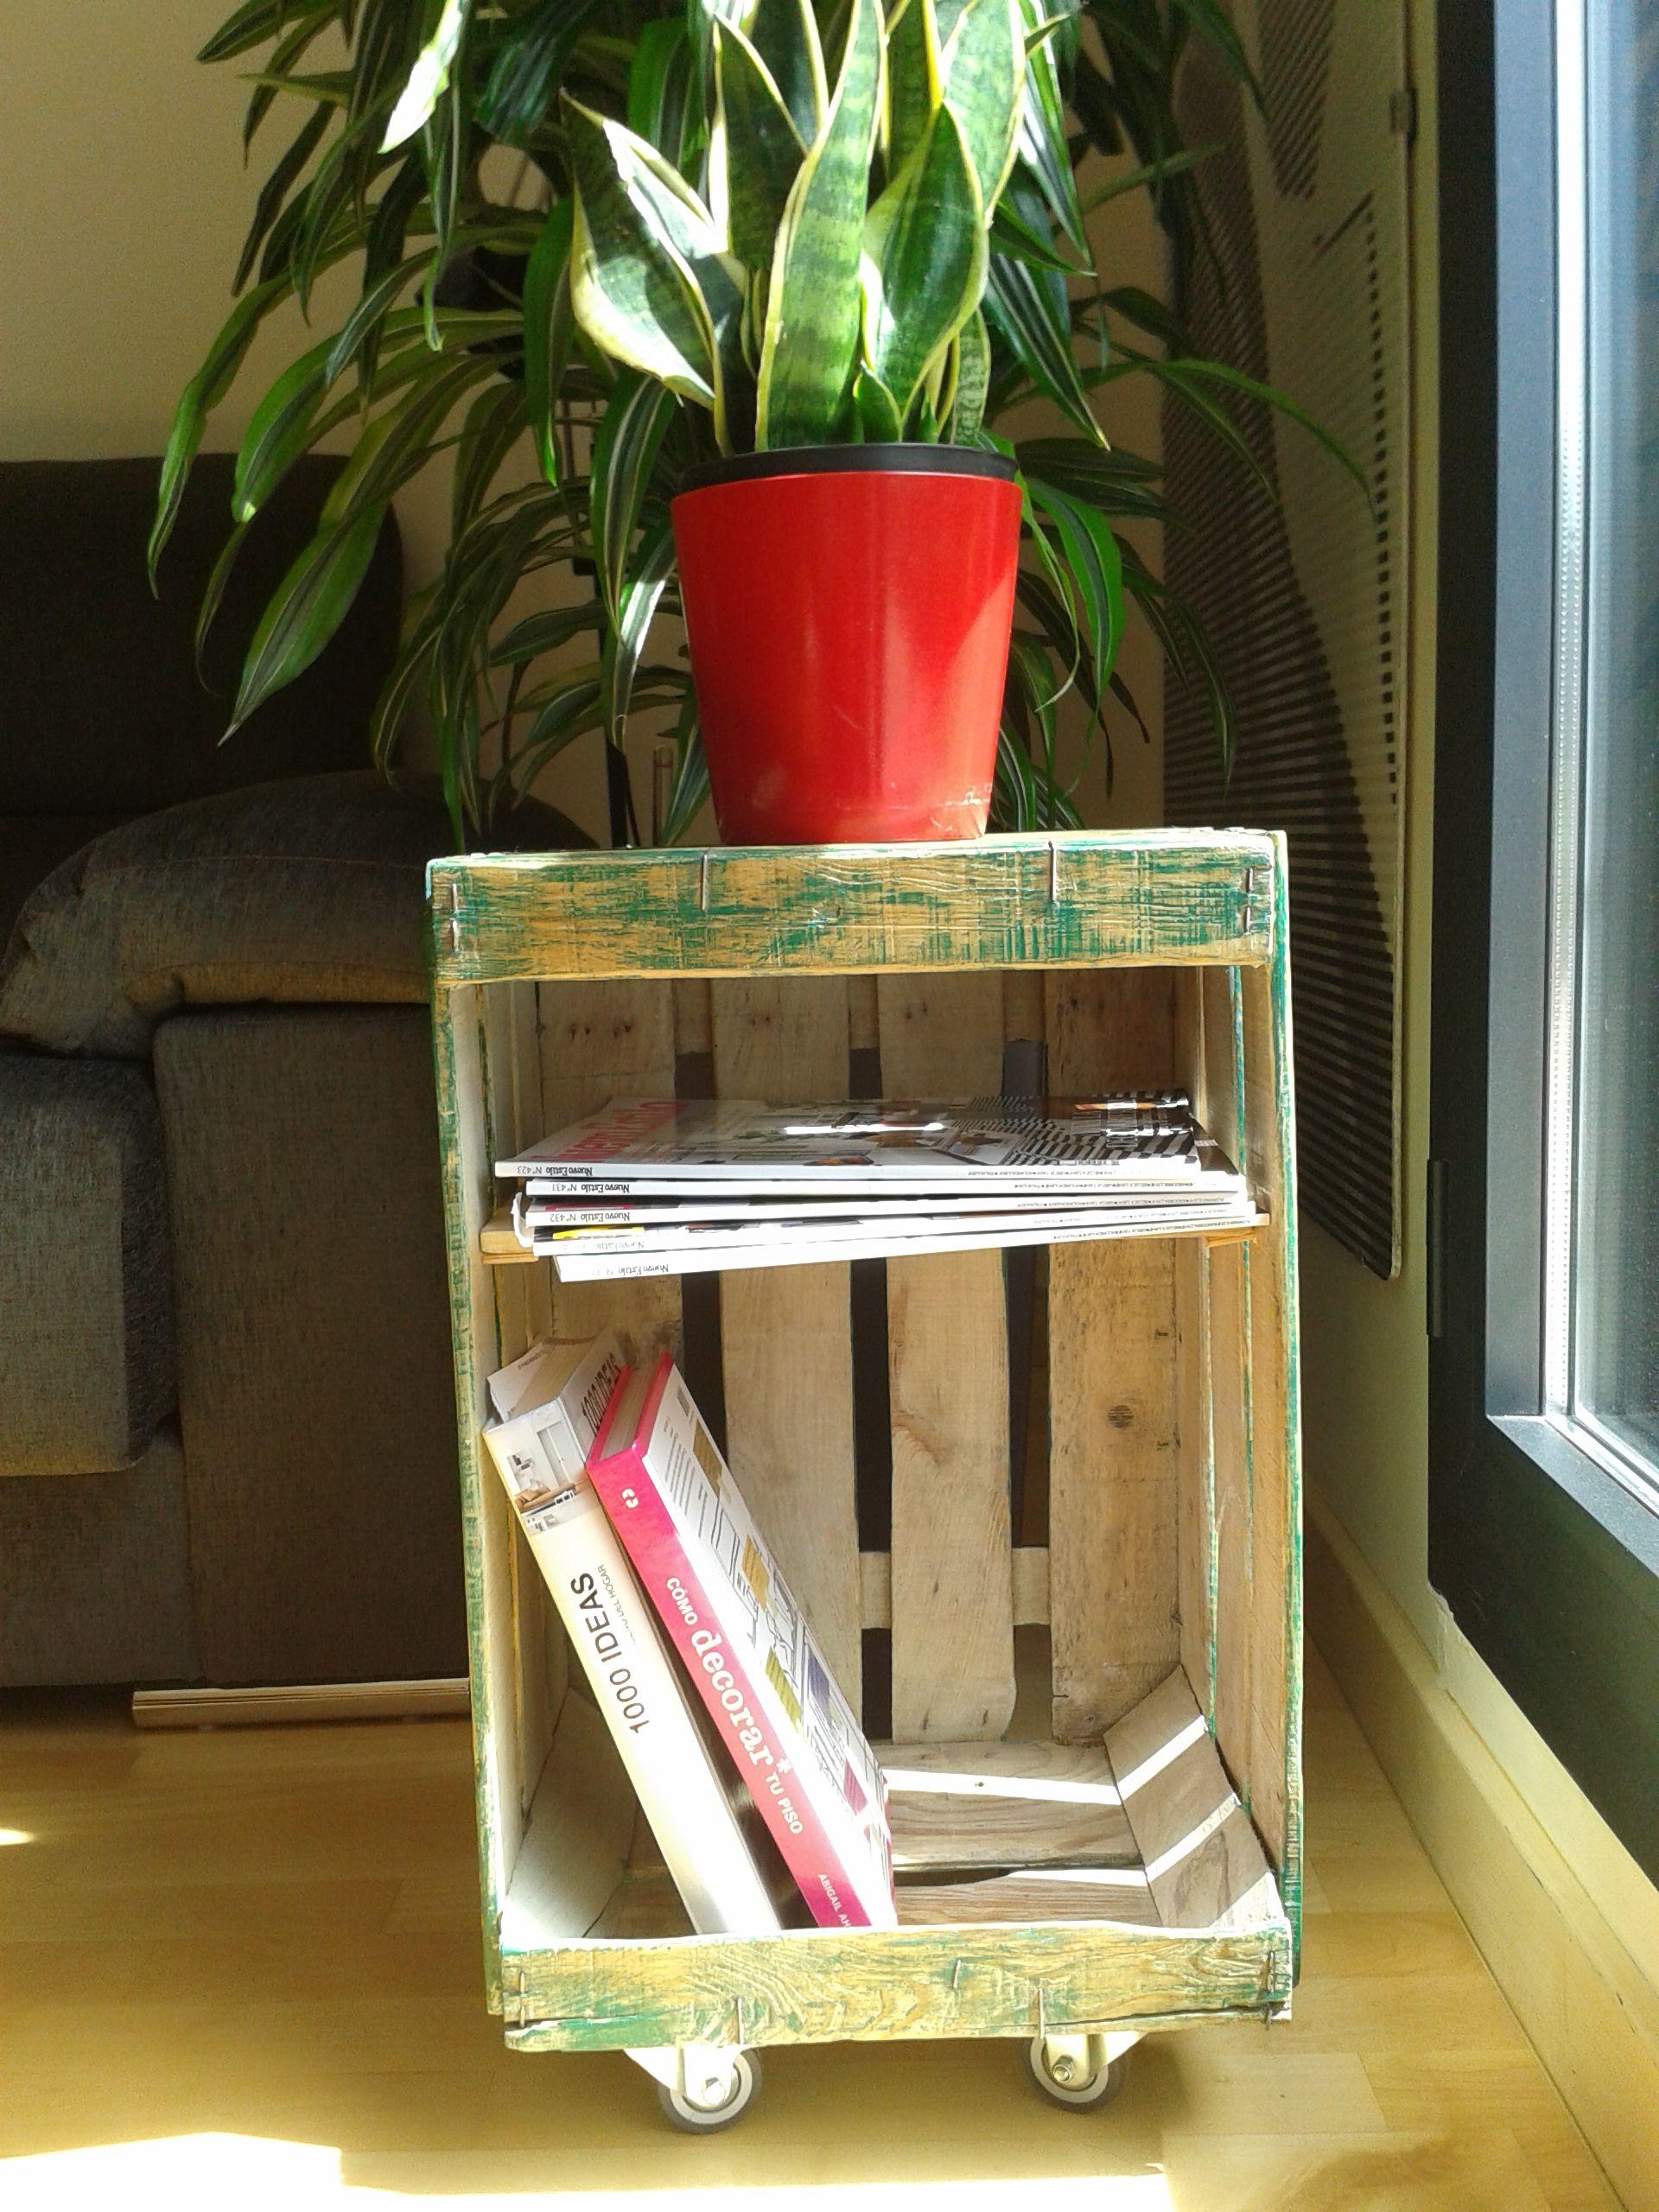 Caja De Madera Restaurada Cajas De Fruta Ruedas Y Fruta # Muebles De Jabas De Madera